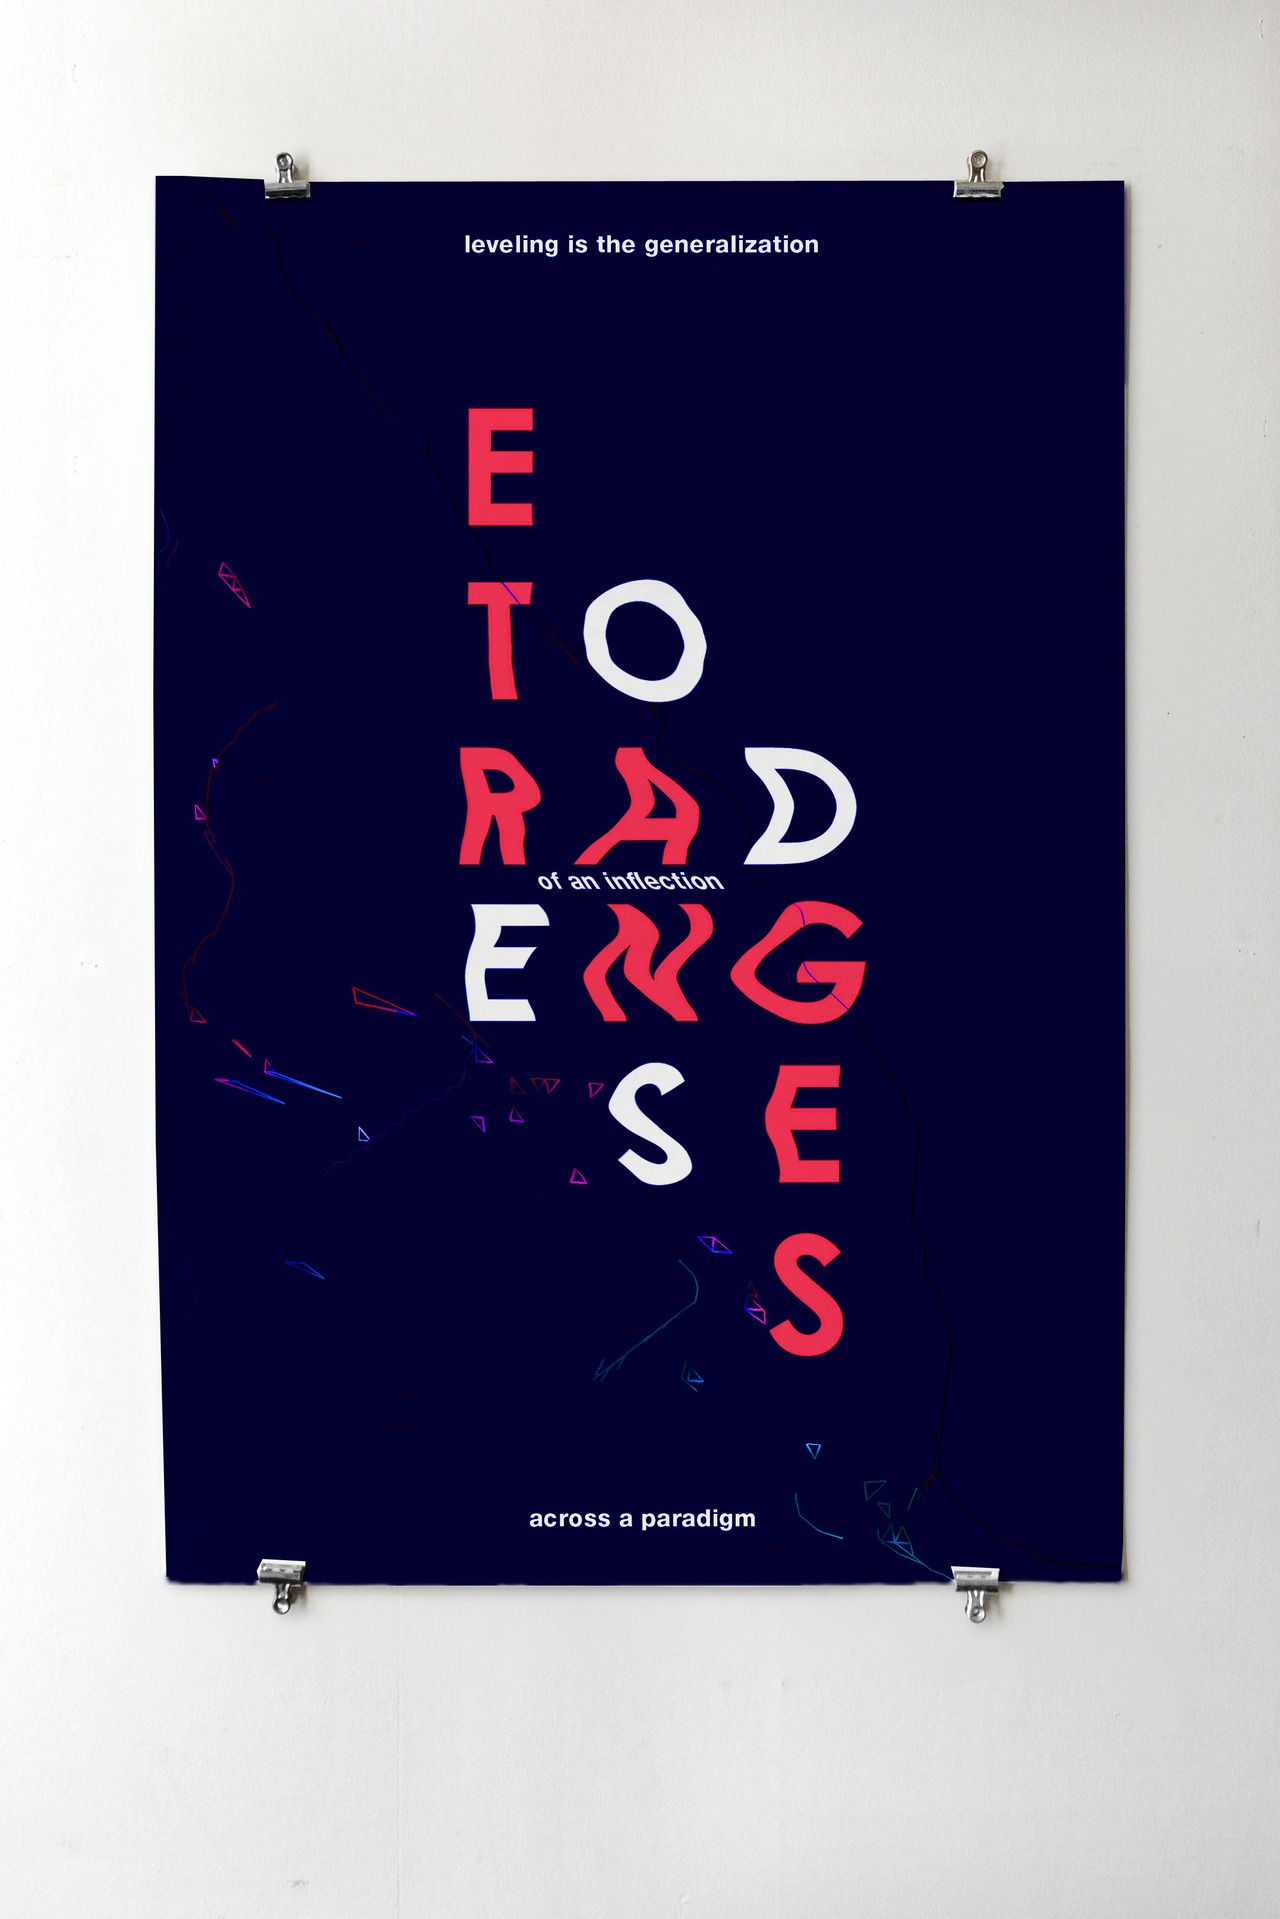 25 Creative Poster Design Inspiration - youandsaturation ... for Creative Poster Designs Inspiration  35fsj